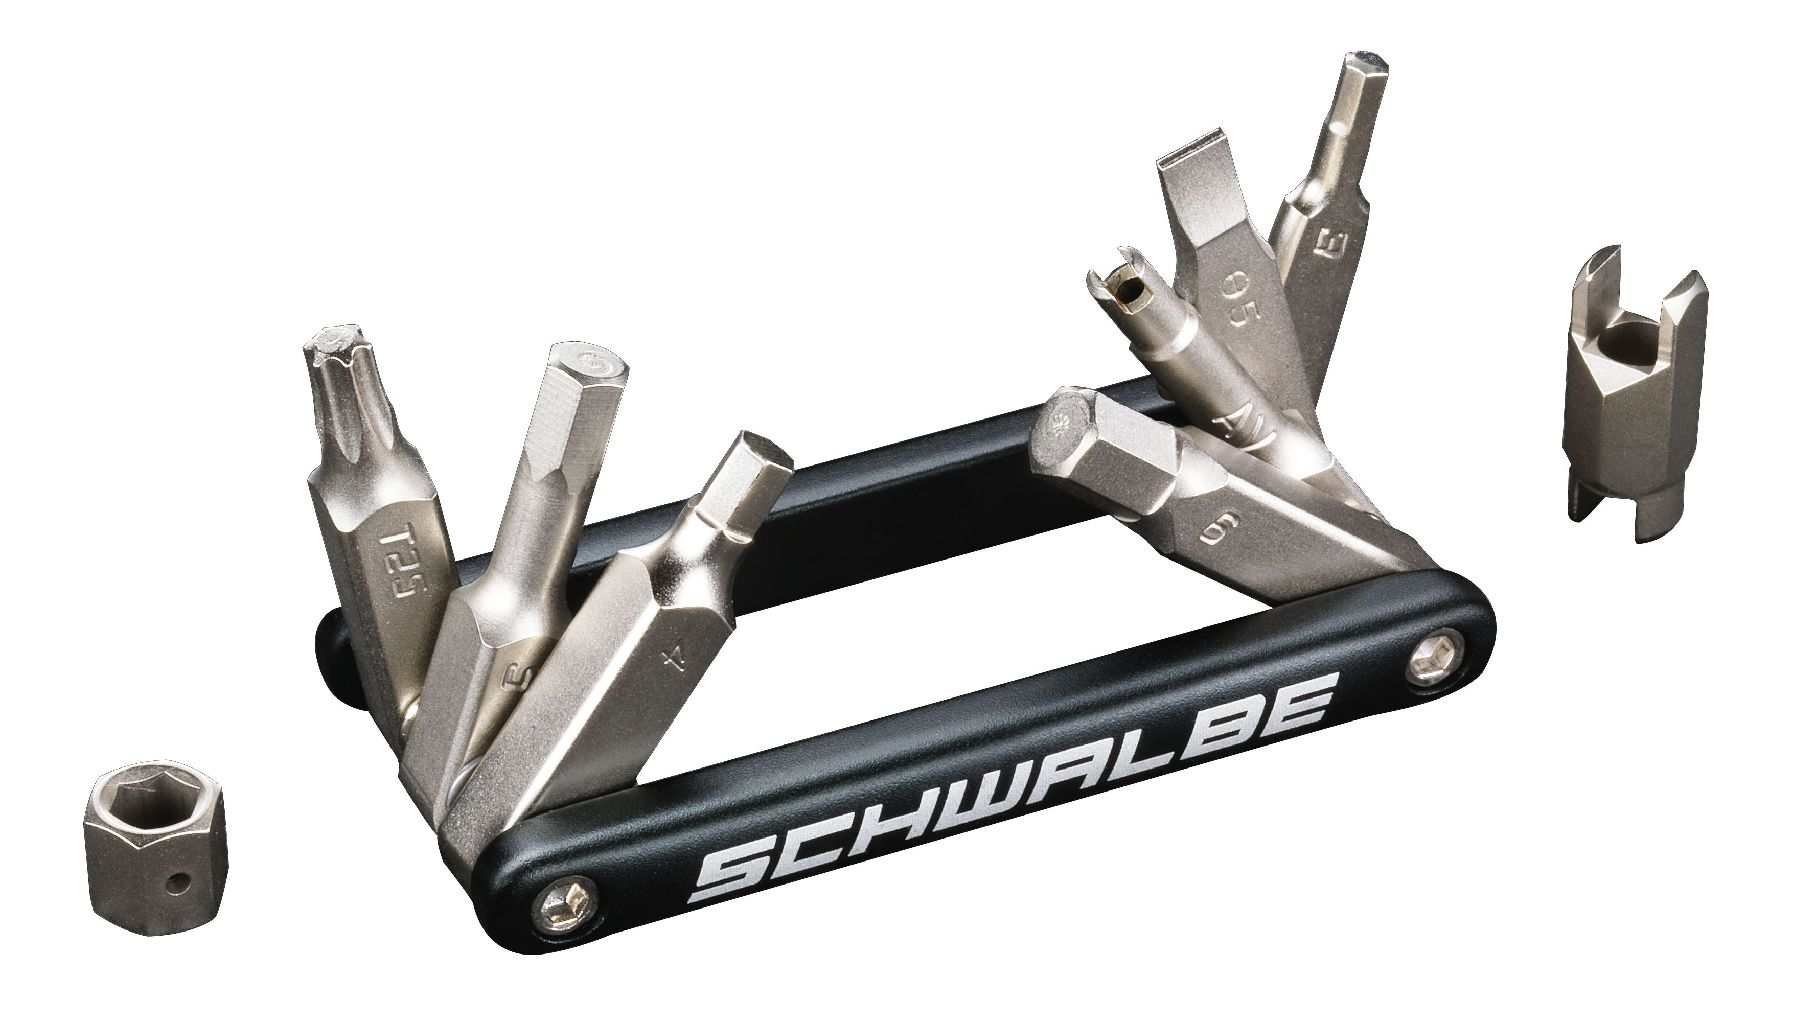 Schwalbe Multitool 10 Funktionen - Bikedreams & Dustbikes